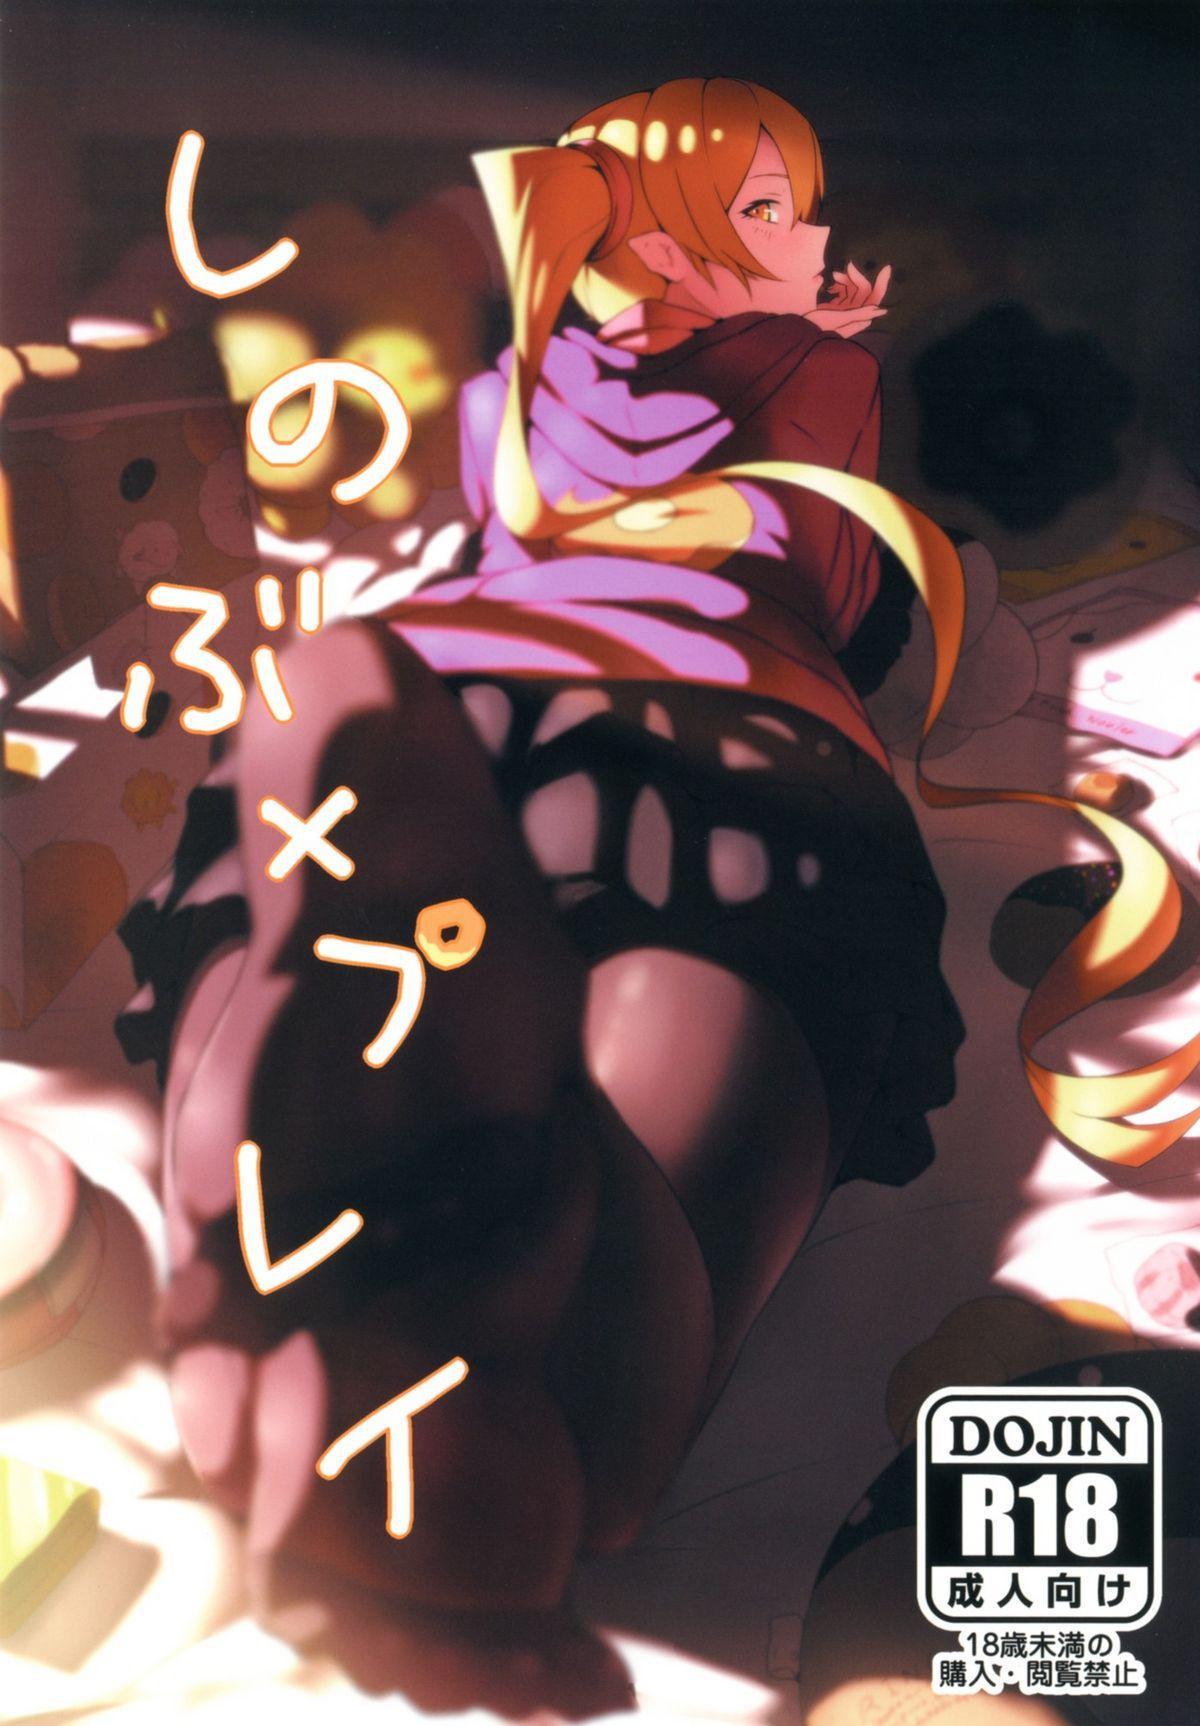 Shinobu x Play 0